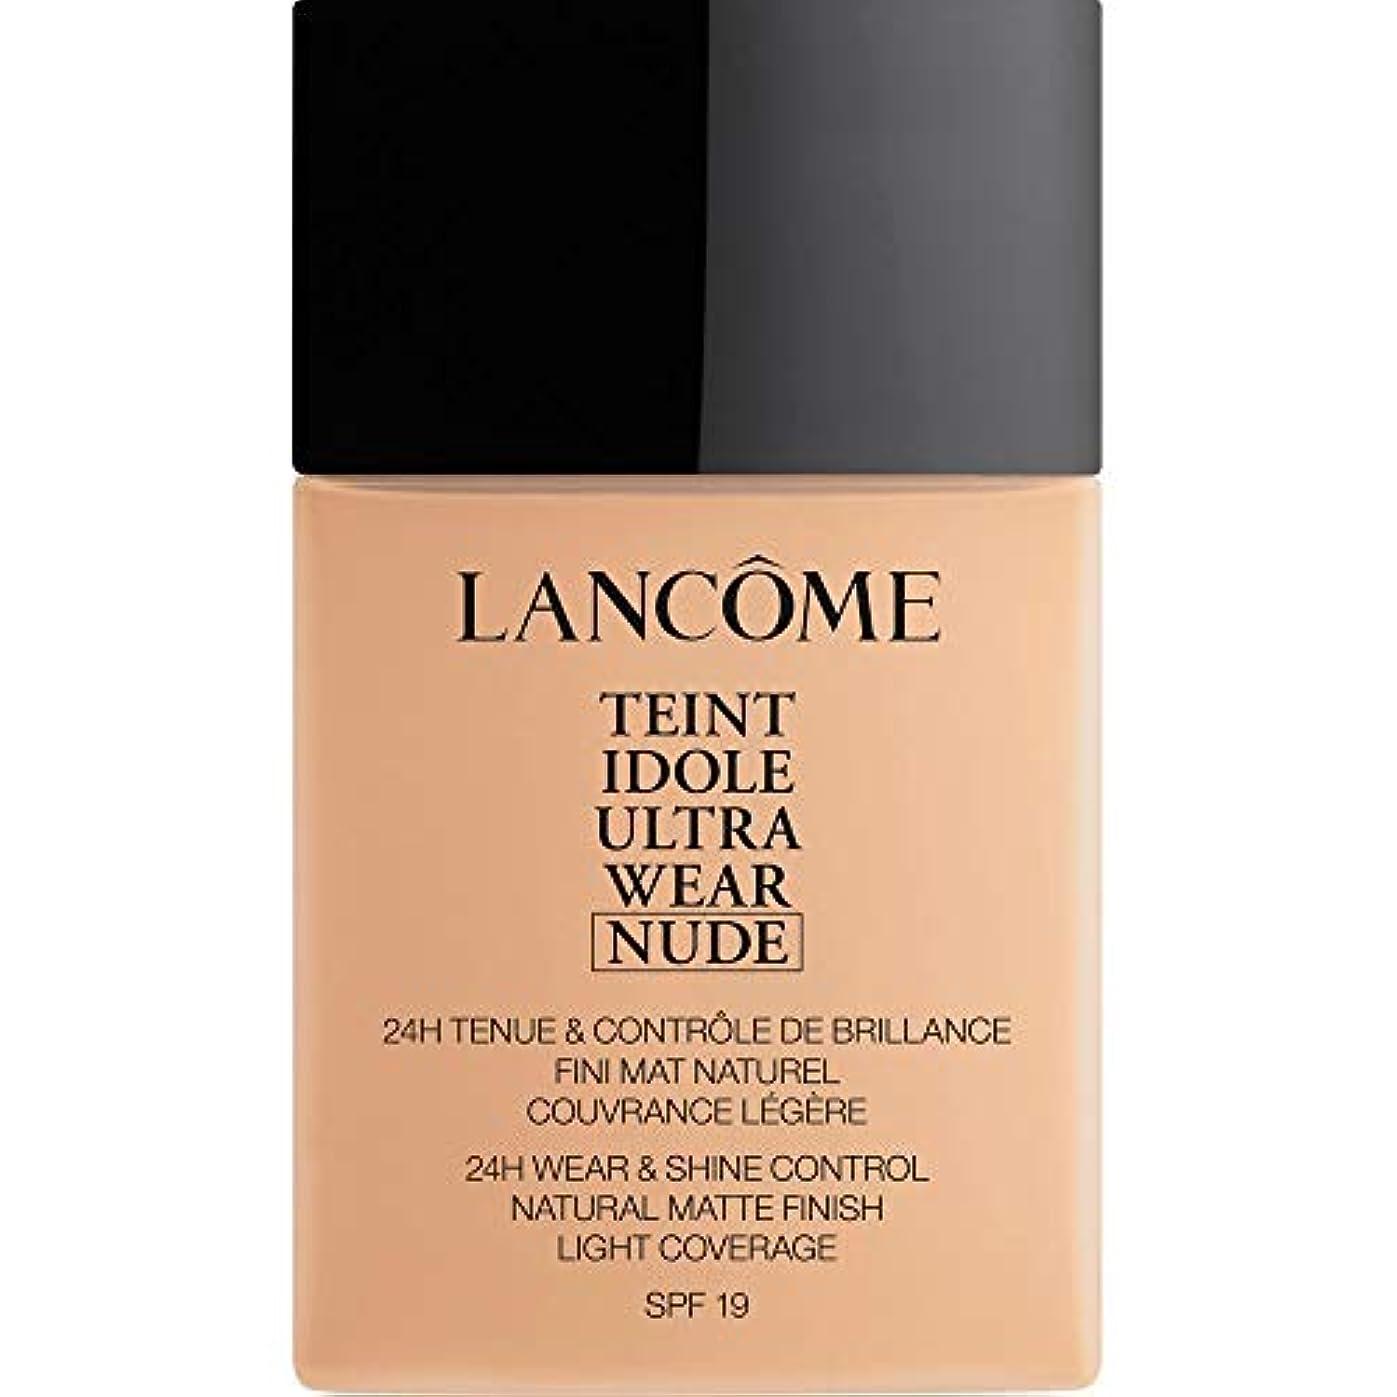 [Lanc?me ] ランコムTeintのIdole超摩耗ヌード財団Spf19の40ミリリットル021 - ベージュジャスミン - Lancome Teint Idole Ultra Wear Nude Foundation...